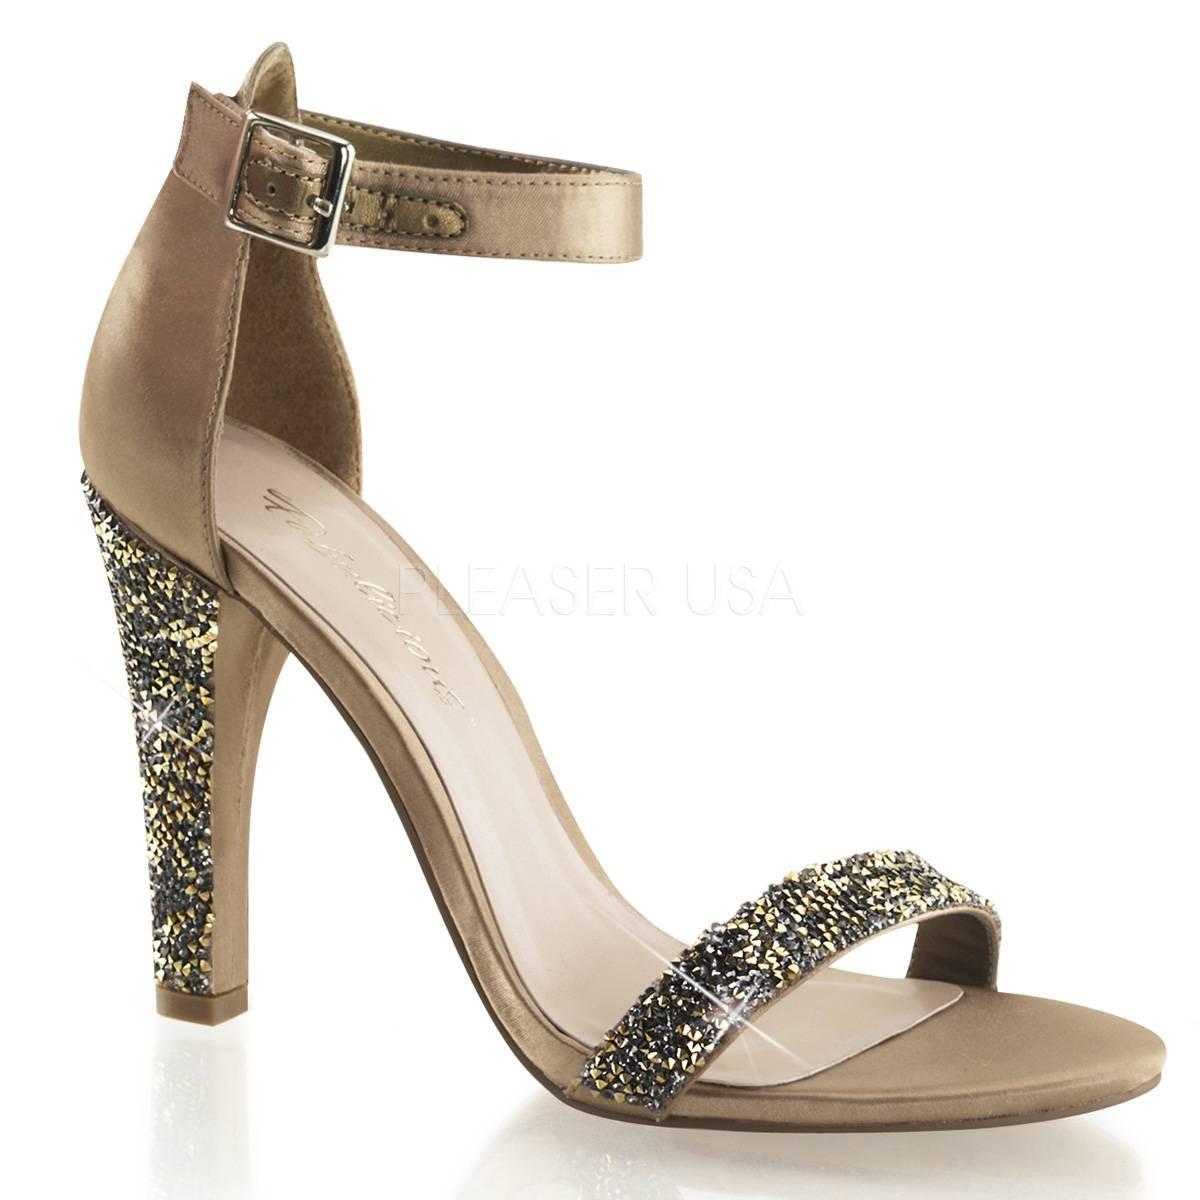 Sandalen - CLEARLY 436 ° Damen Sandalette ° Bronze Satin ° Fabulicious  - Onlineshop RedSixty